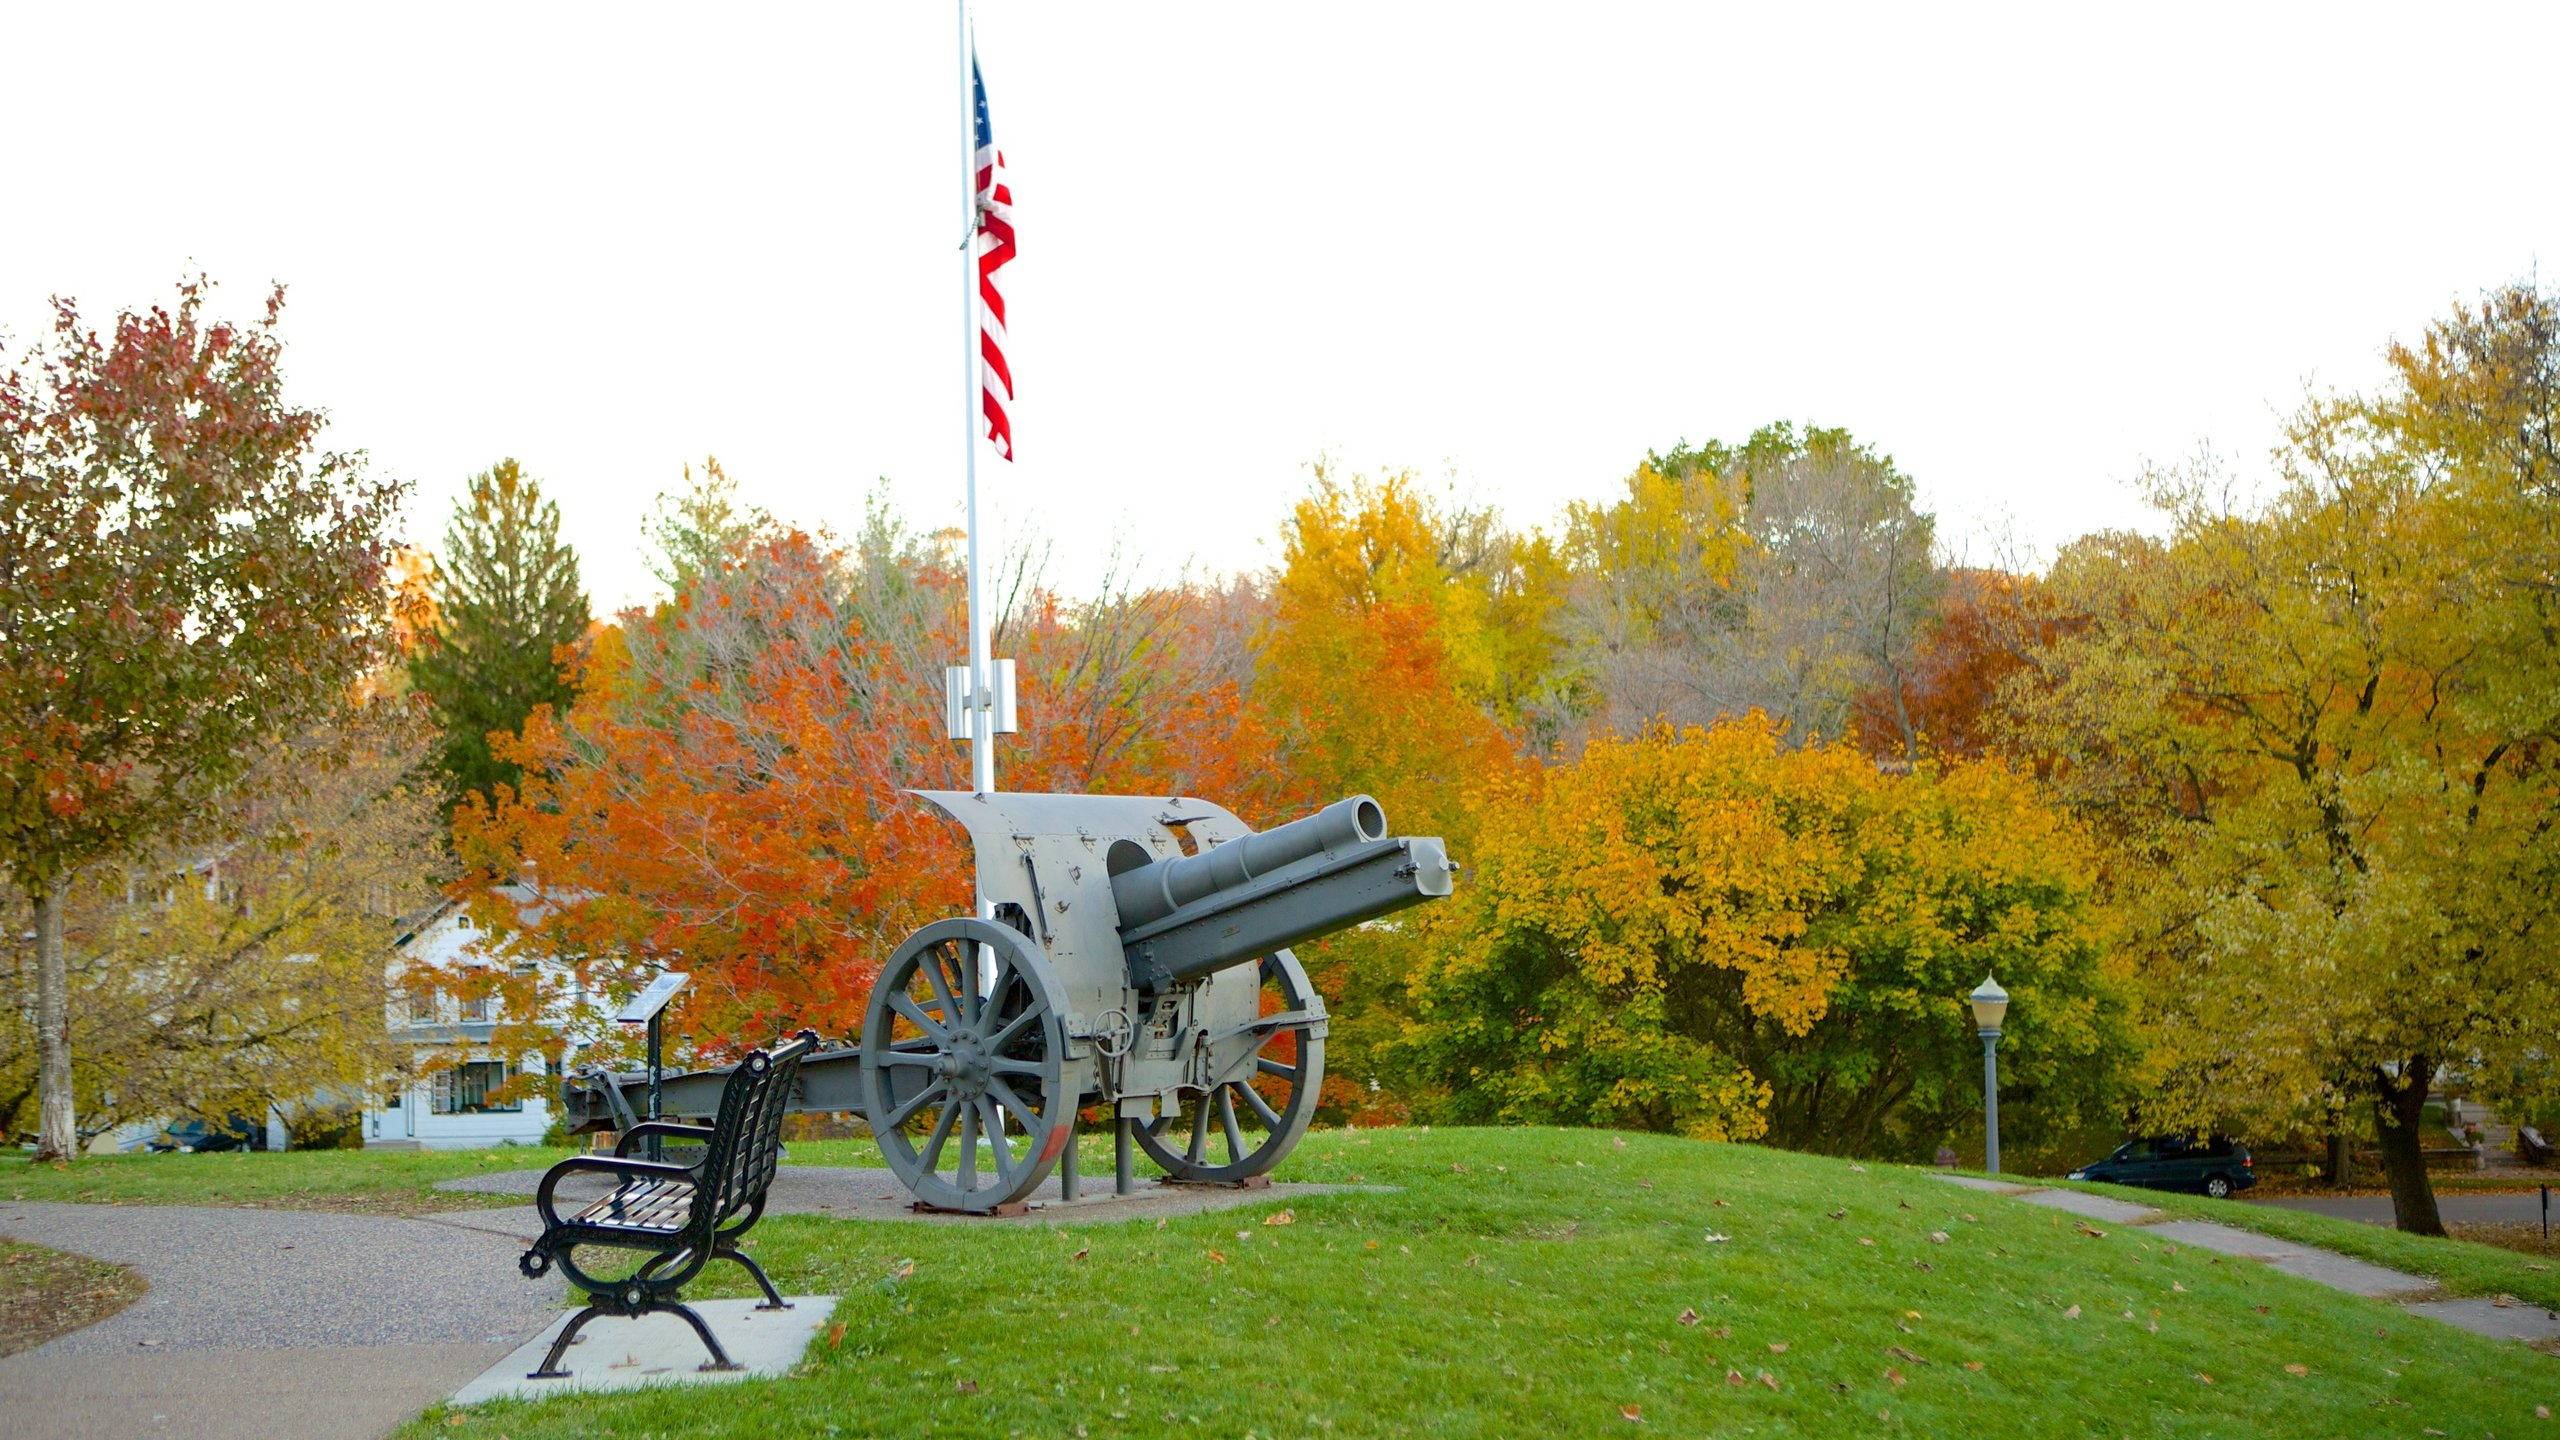 Grant Park, Galena, Illinois, United States of America